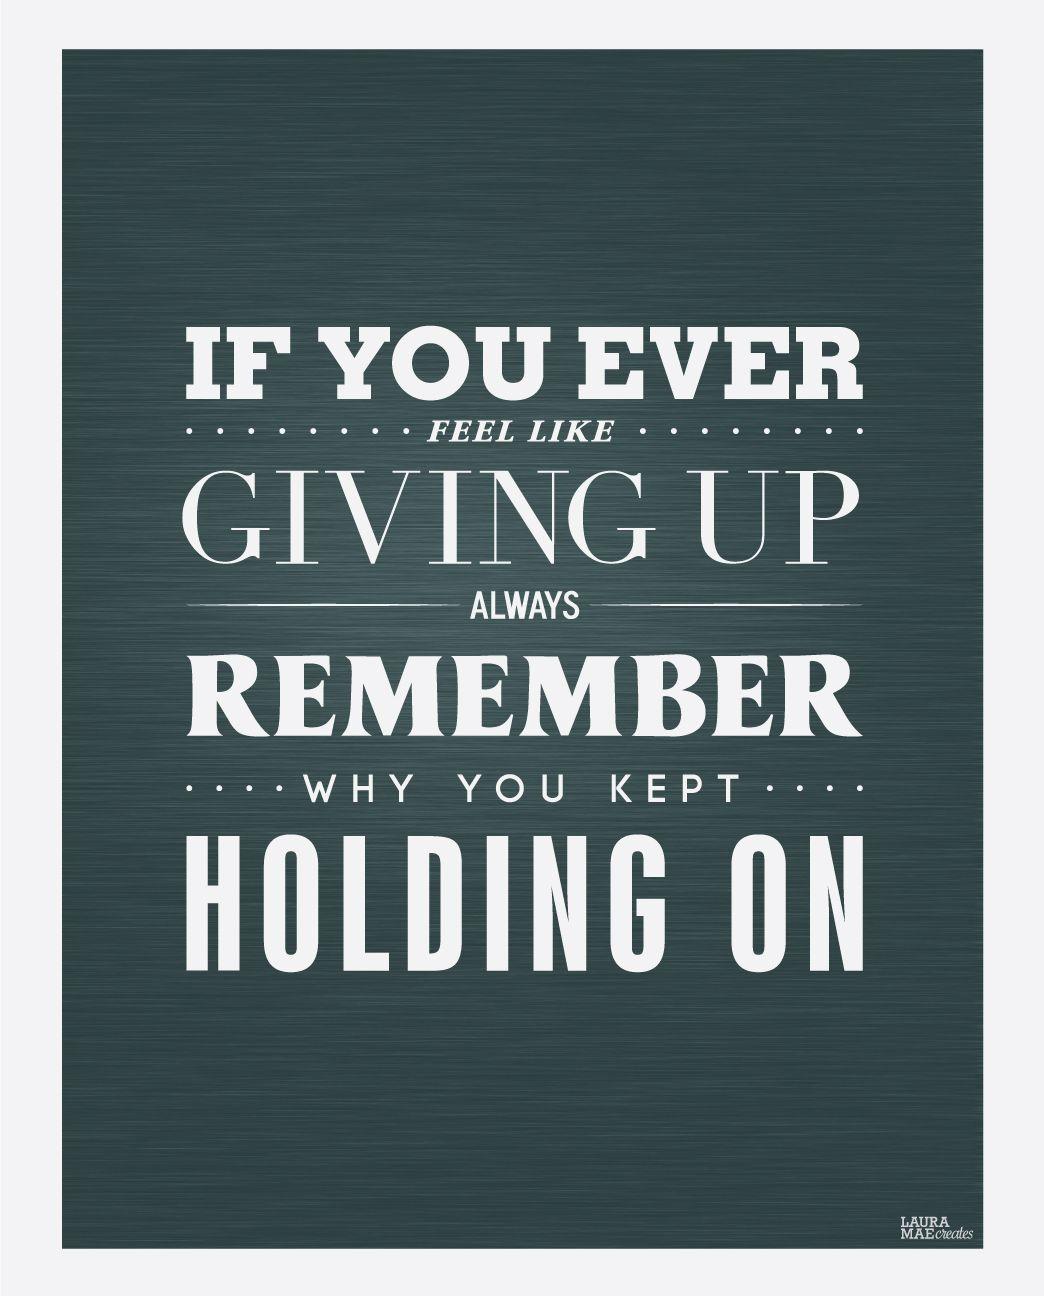 Motivational Inspirational Quotes: Faith, Hope, Love & Life